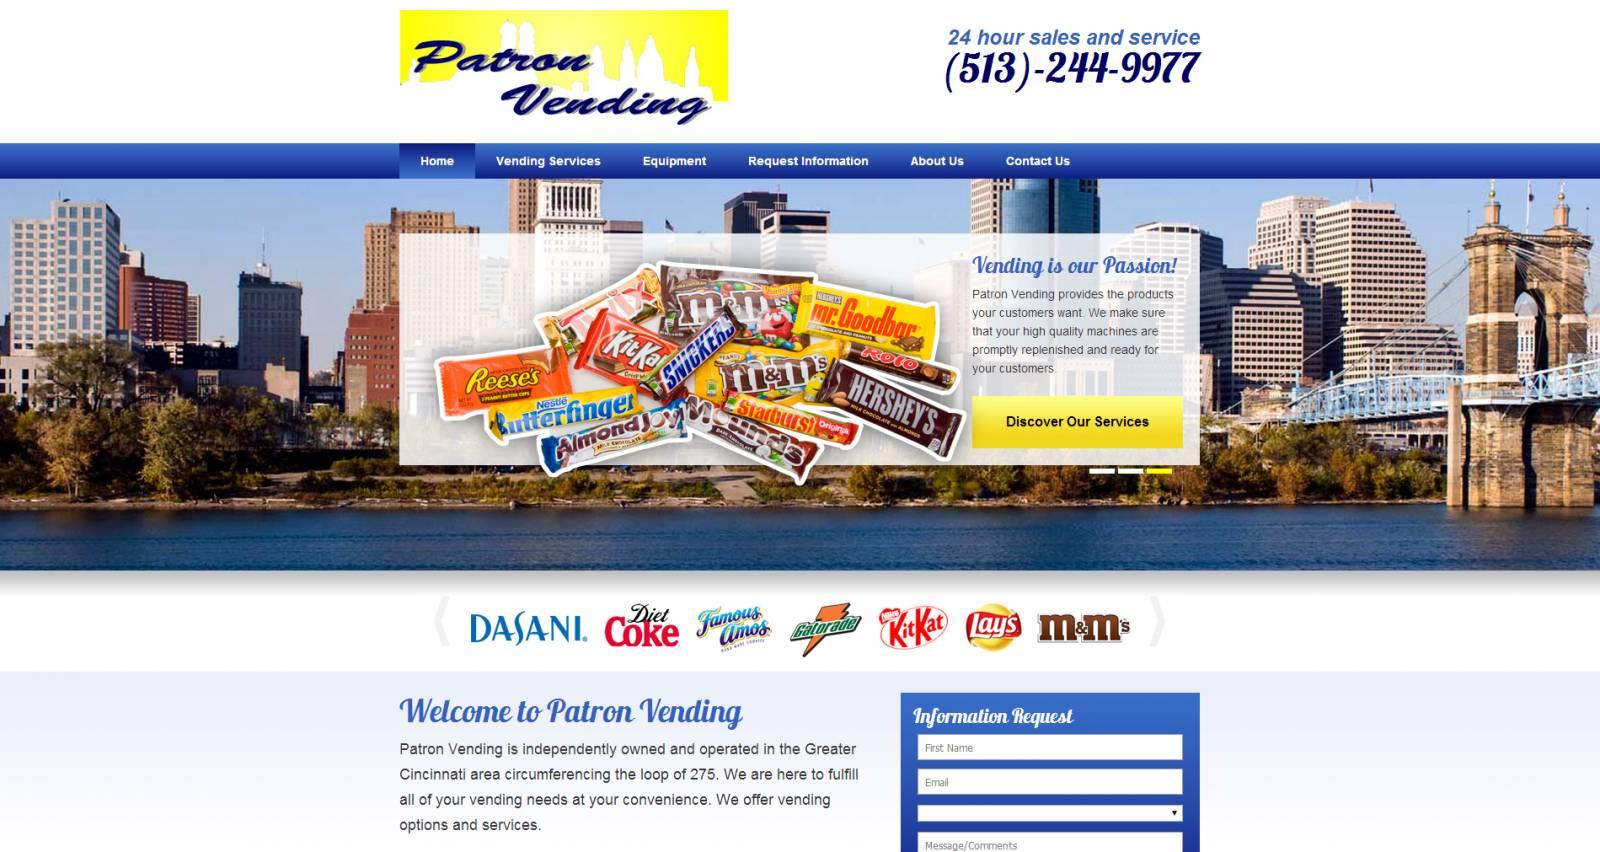 Patron Vending Home page